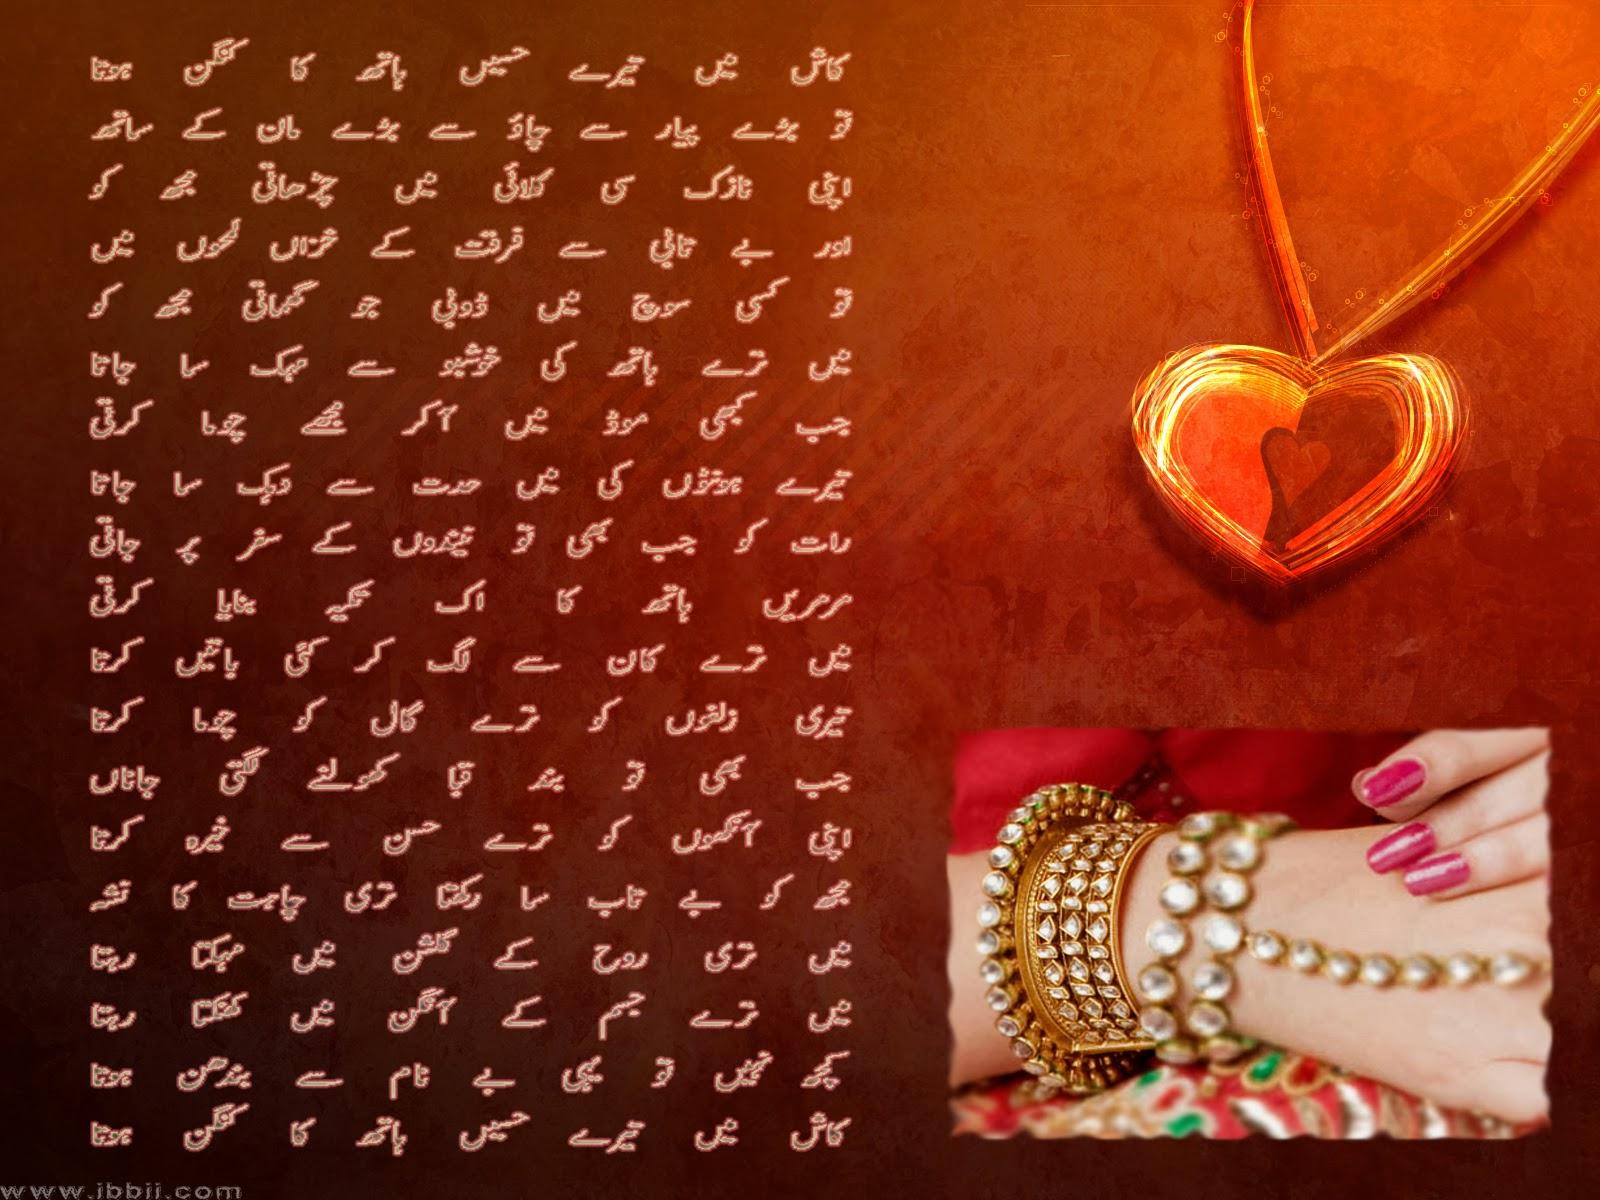 Urdu Poetry Wallpapers Download Hd Wallpapers 2u Download 1600x1200